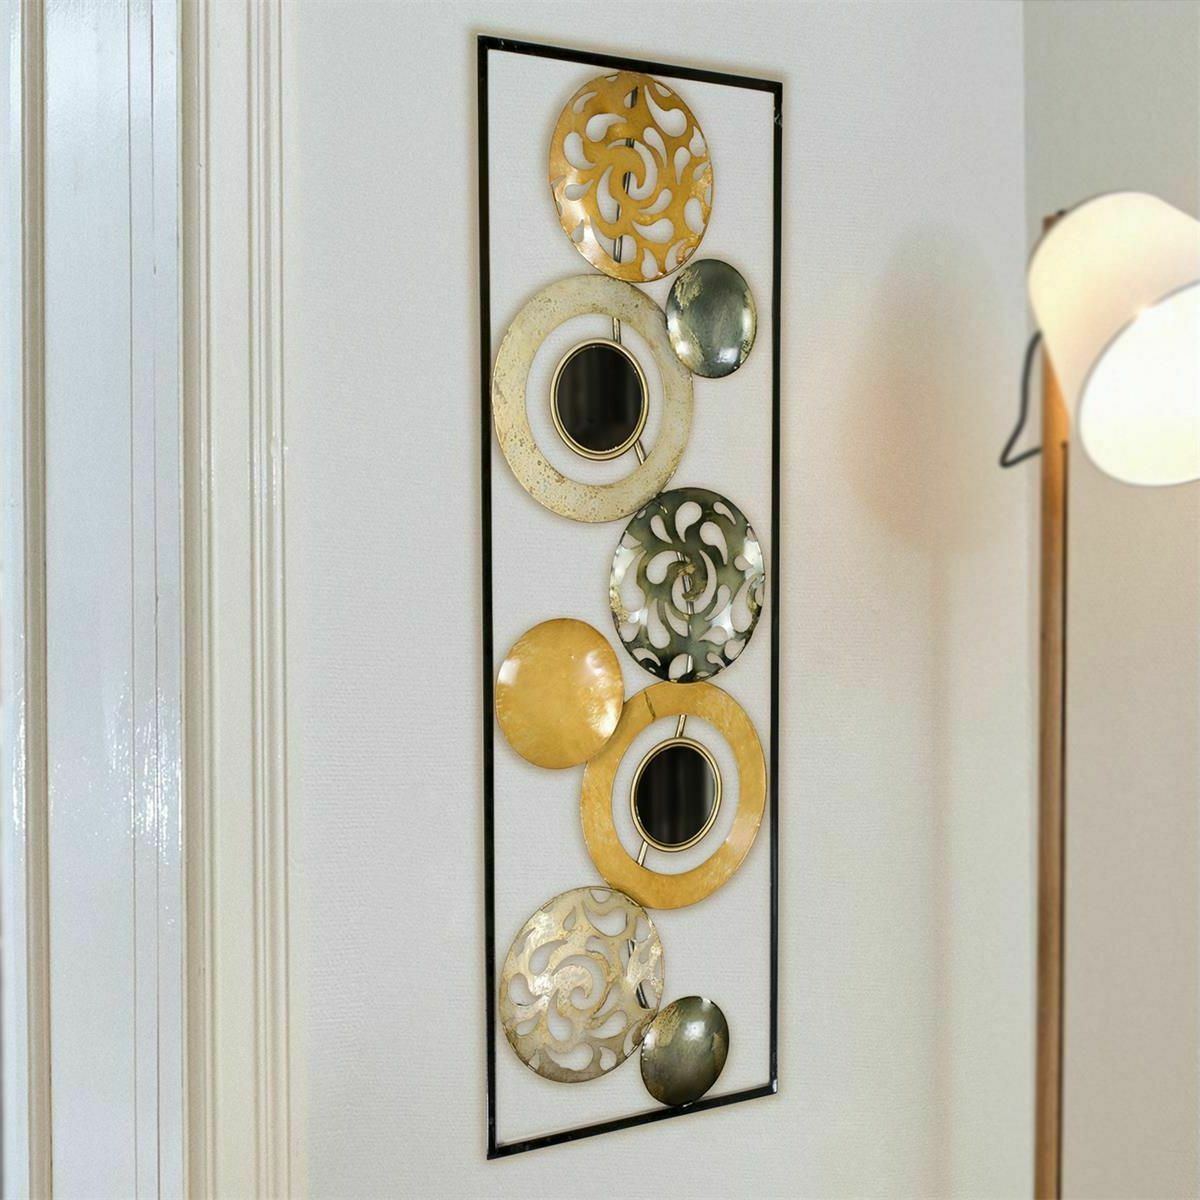 Metallbild Wandbild Kreise Ringe 31x90cm silber Gold gerahmt Wanddeko